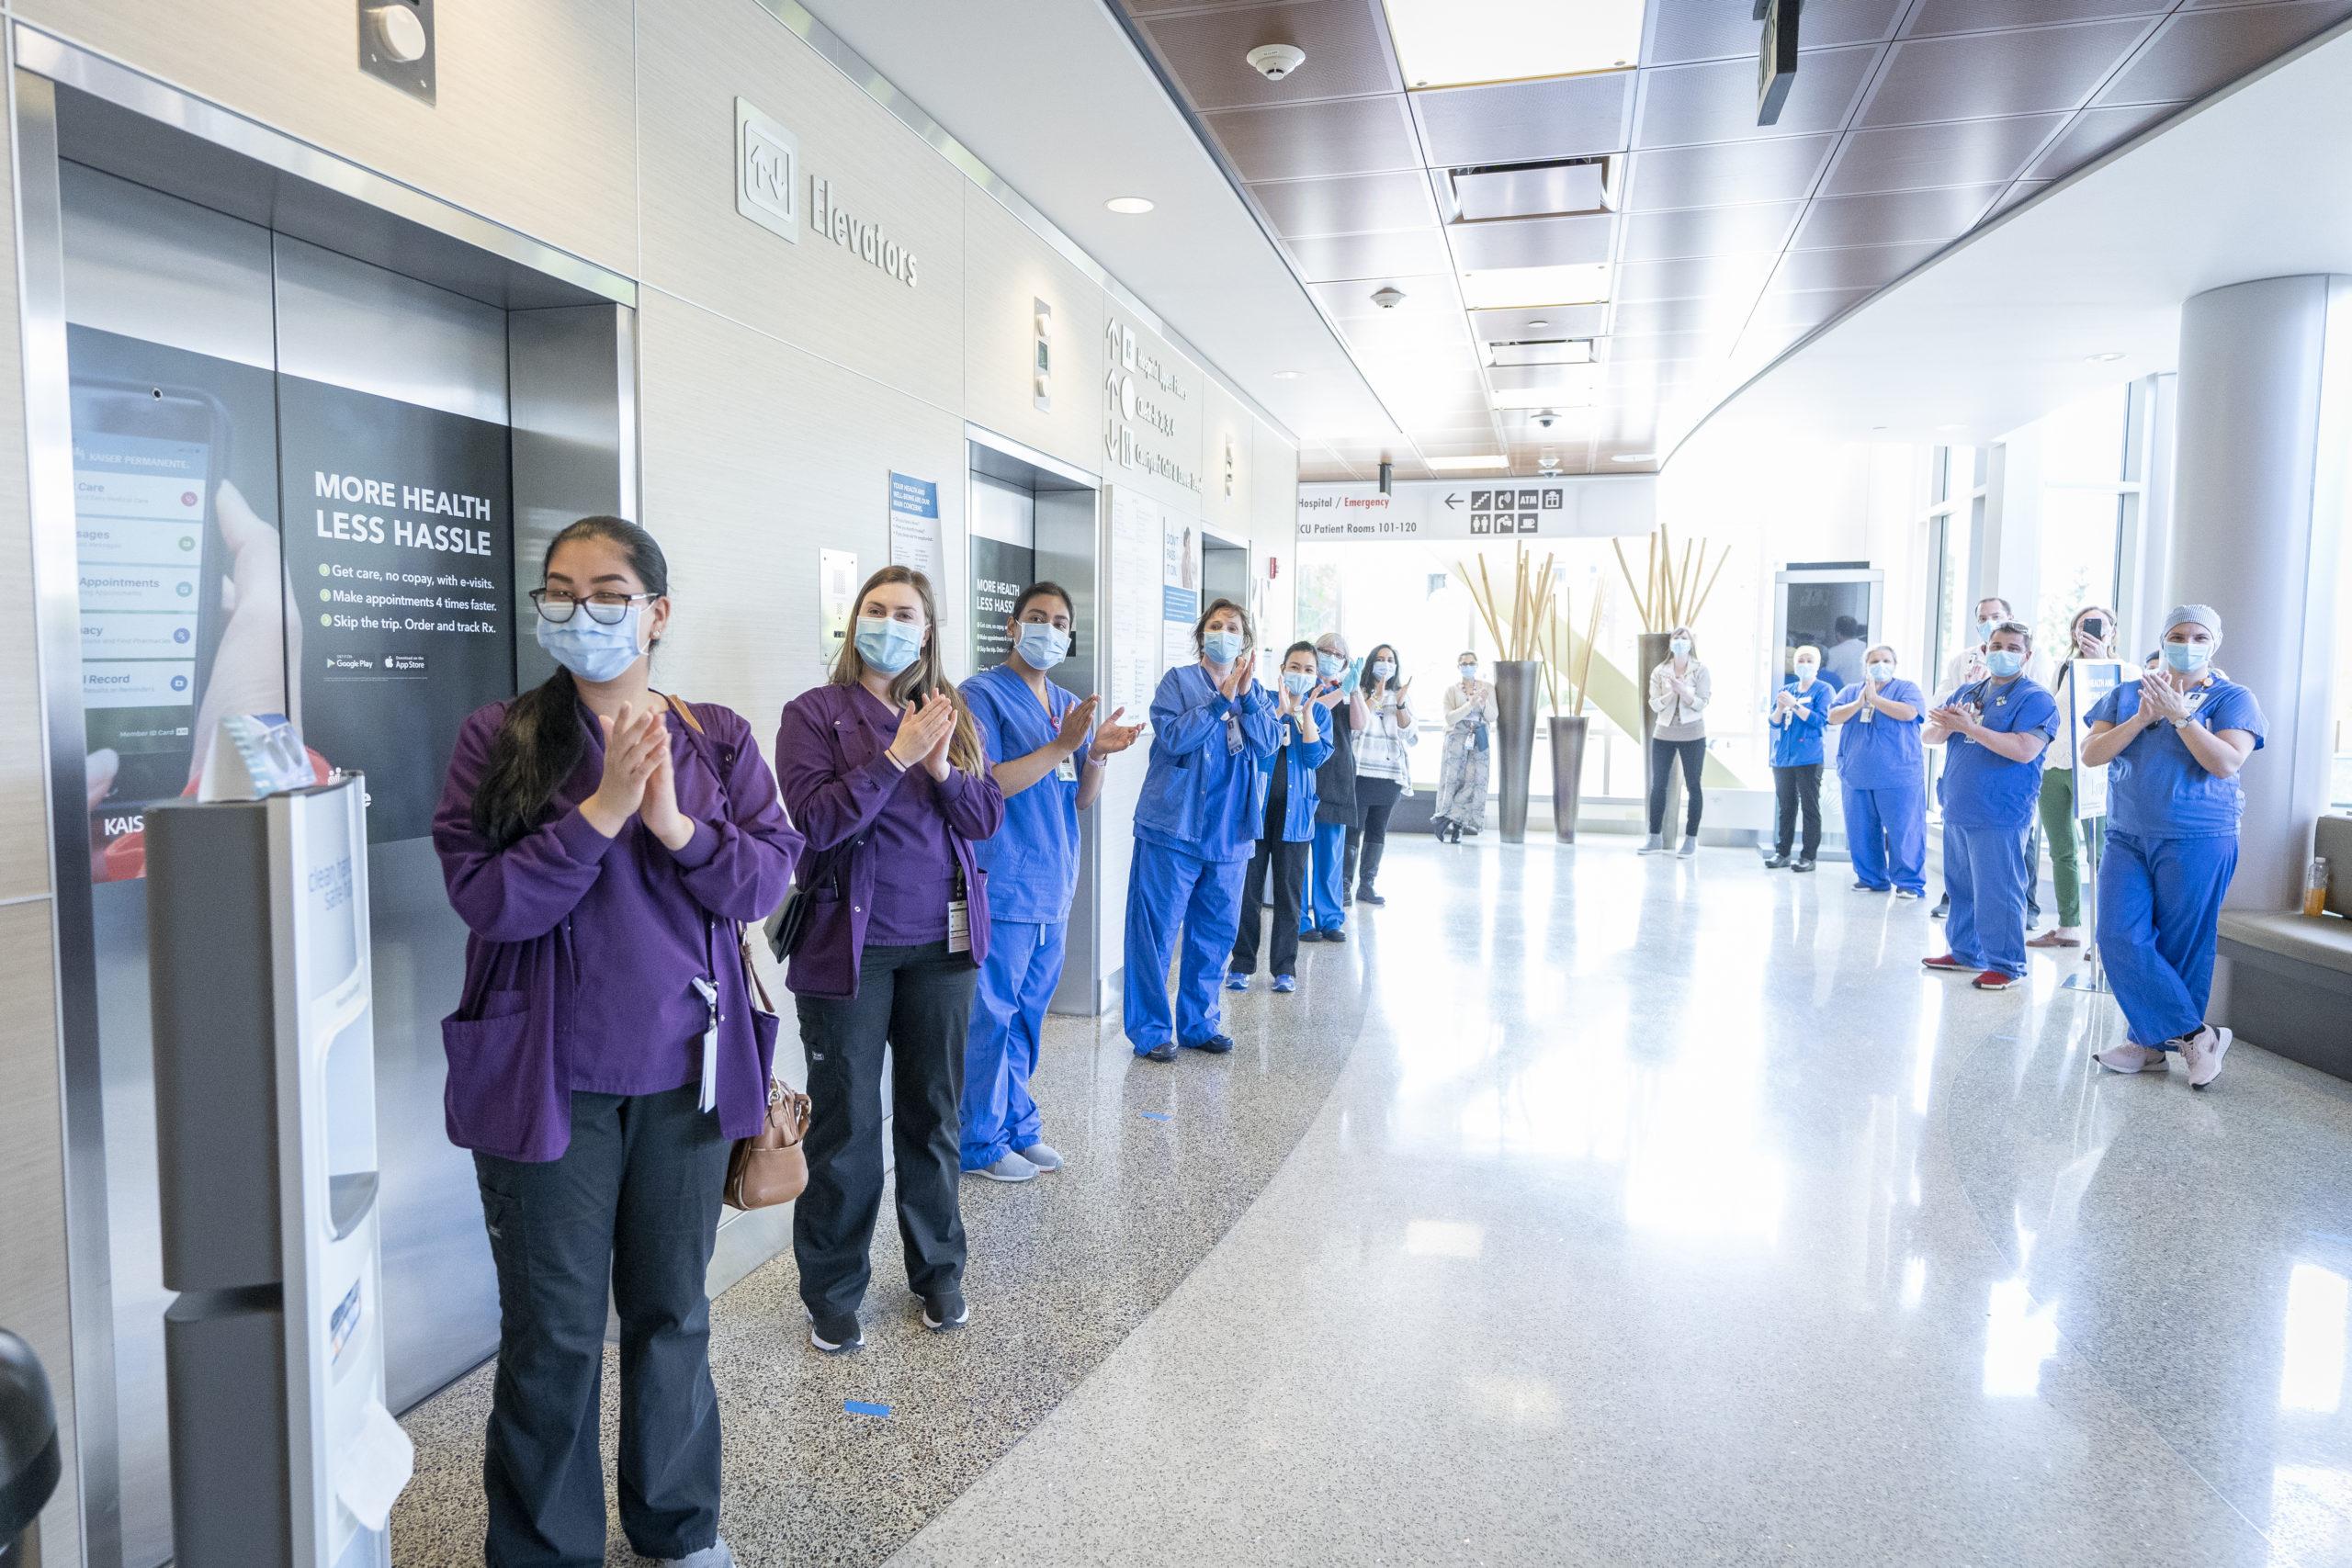 Tweetcap: Medical Community Unites Around #MedicineForMasks